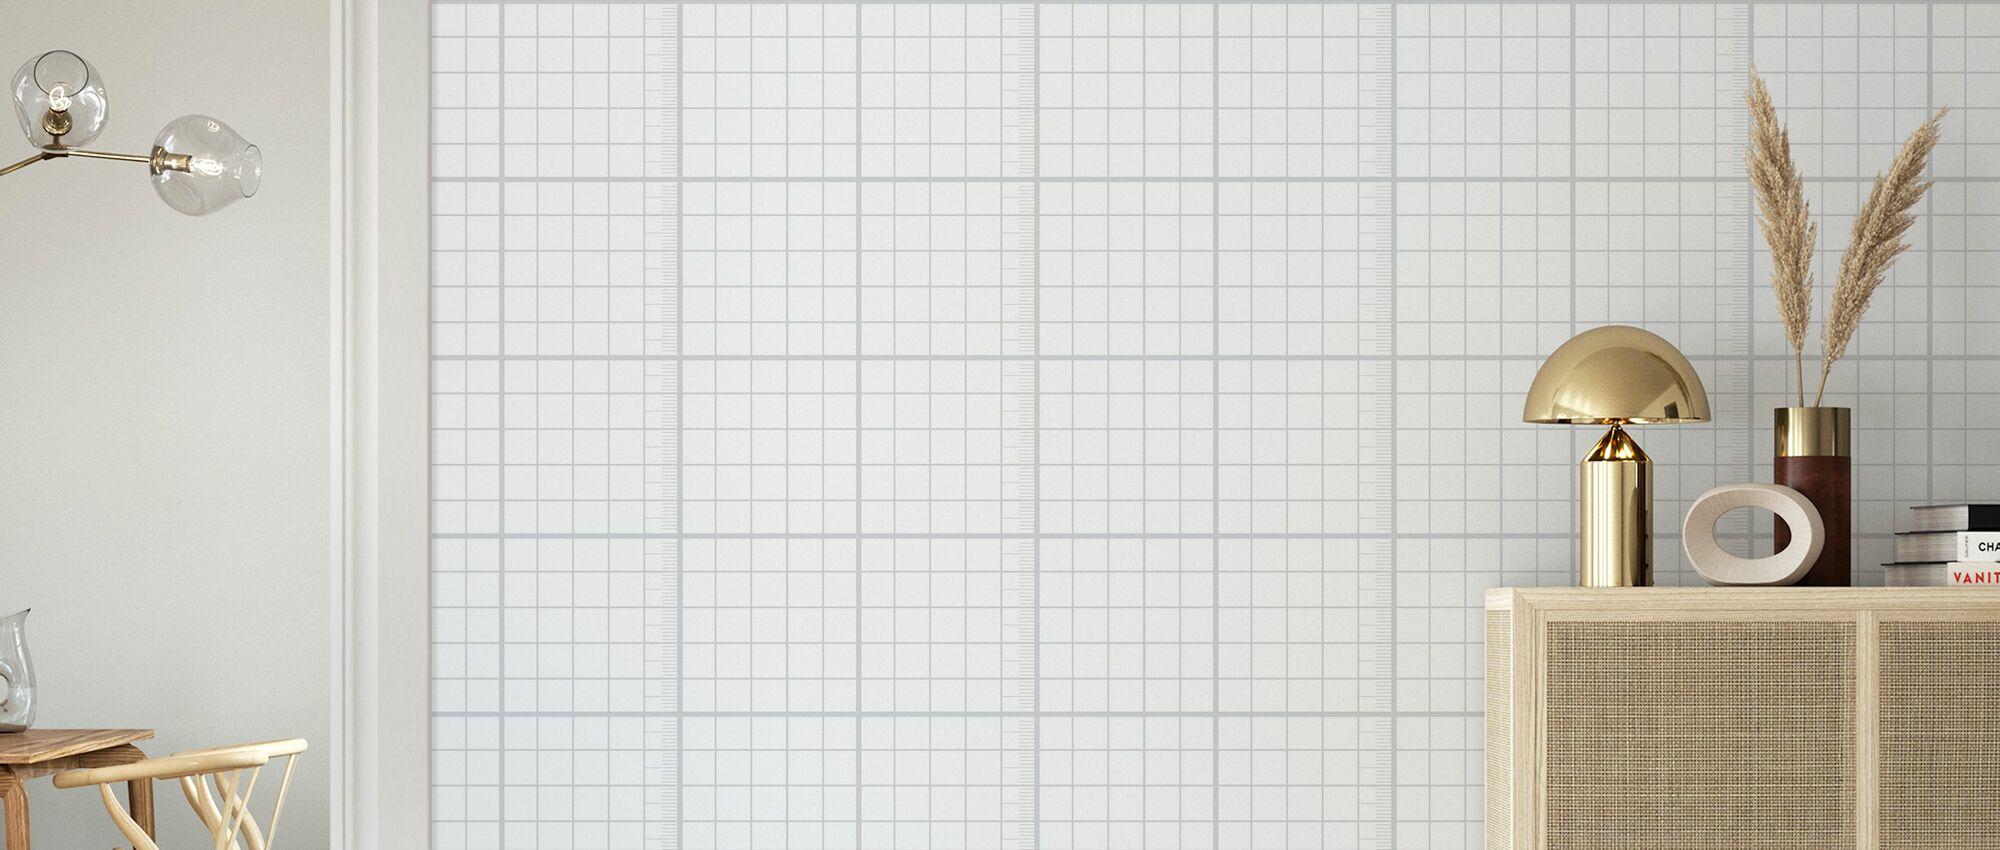 Kubik - Wit Grijs - Behang - Woonkamer